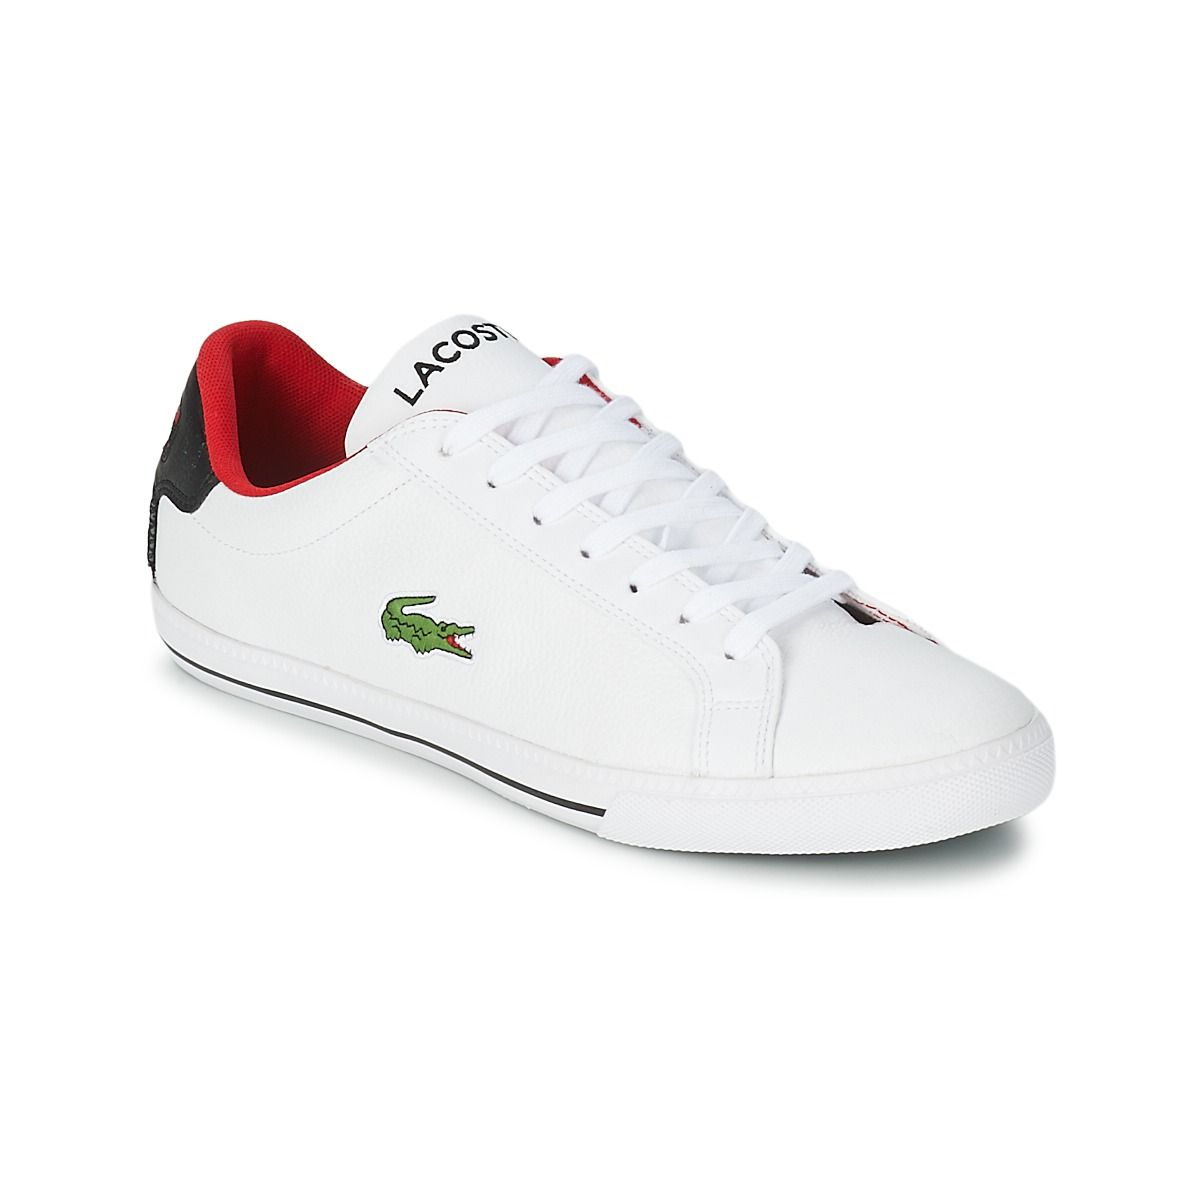 JOUER 117 1 - CHAUSSURES - Sneakers & Tennis bassesLacoste KyoQits